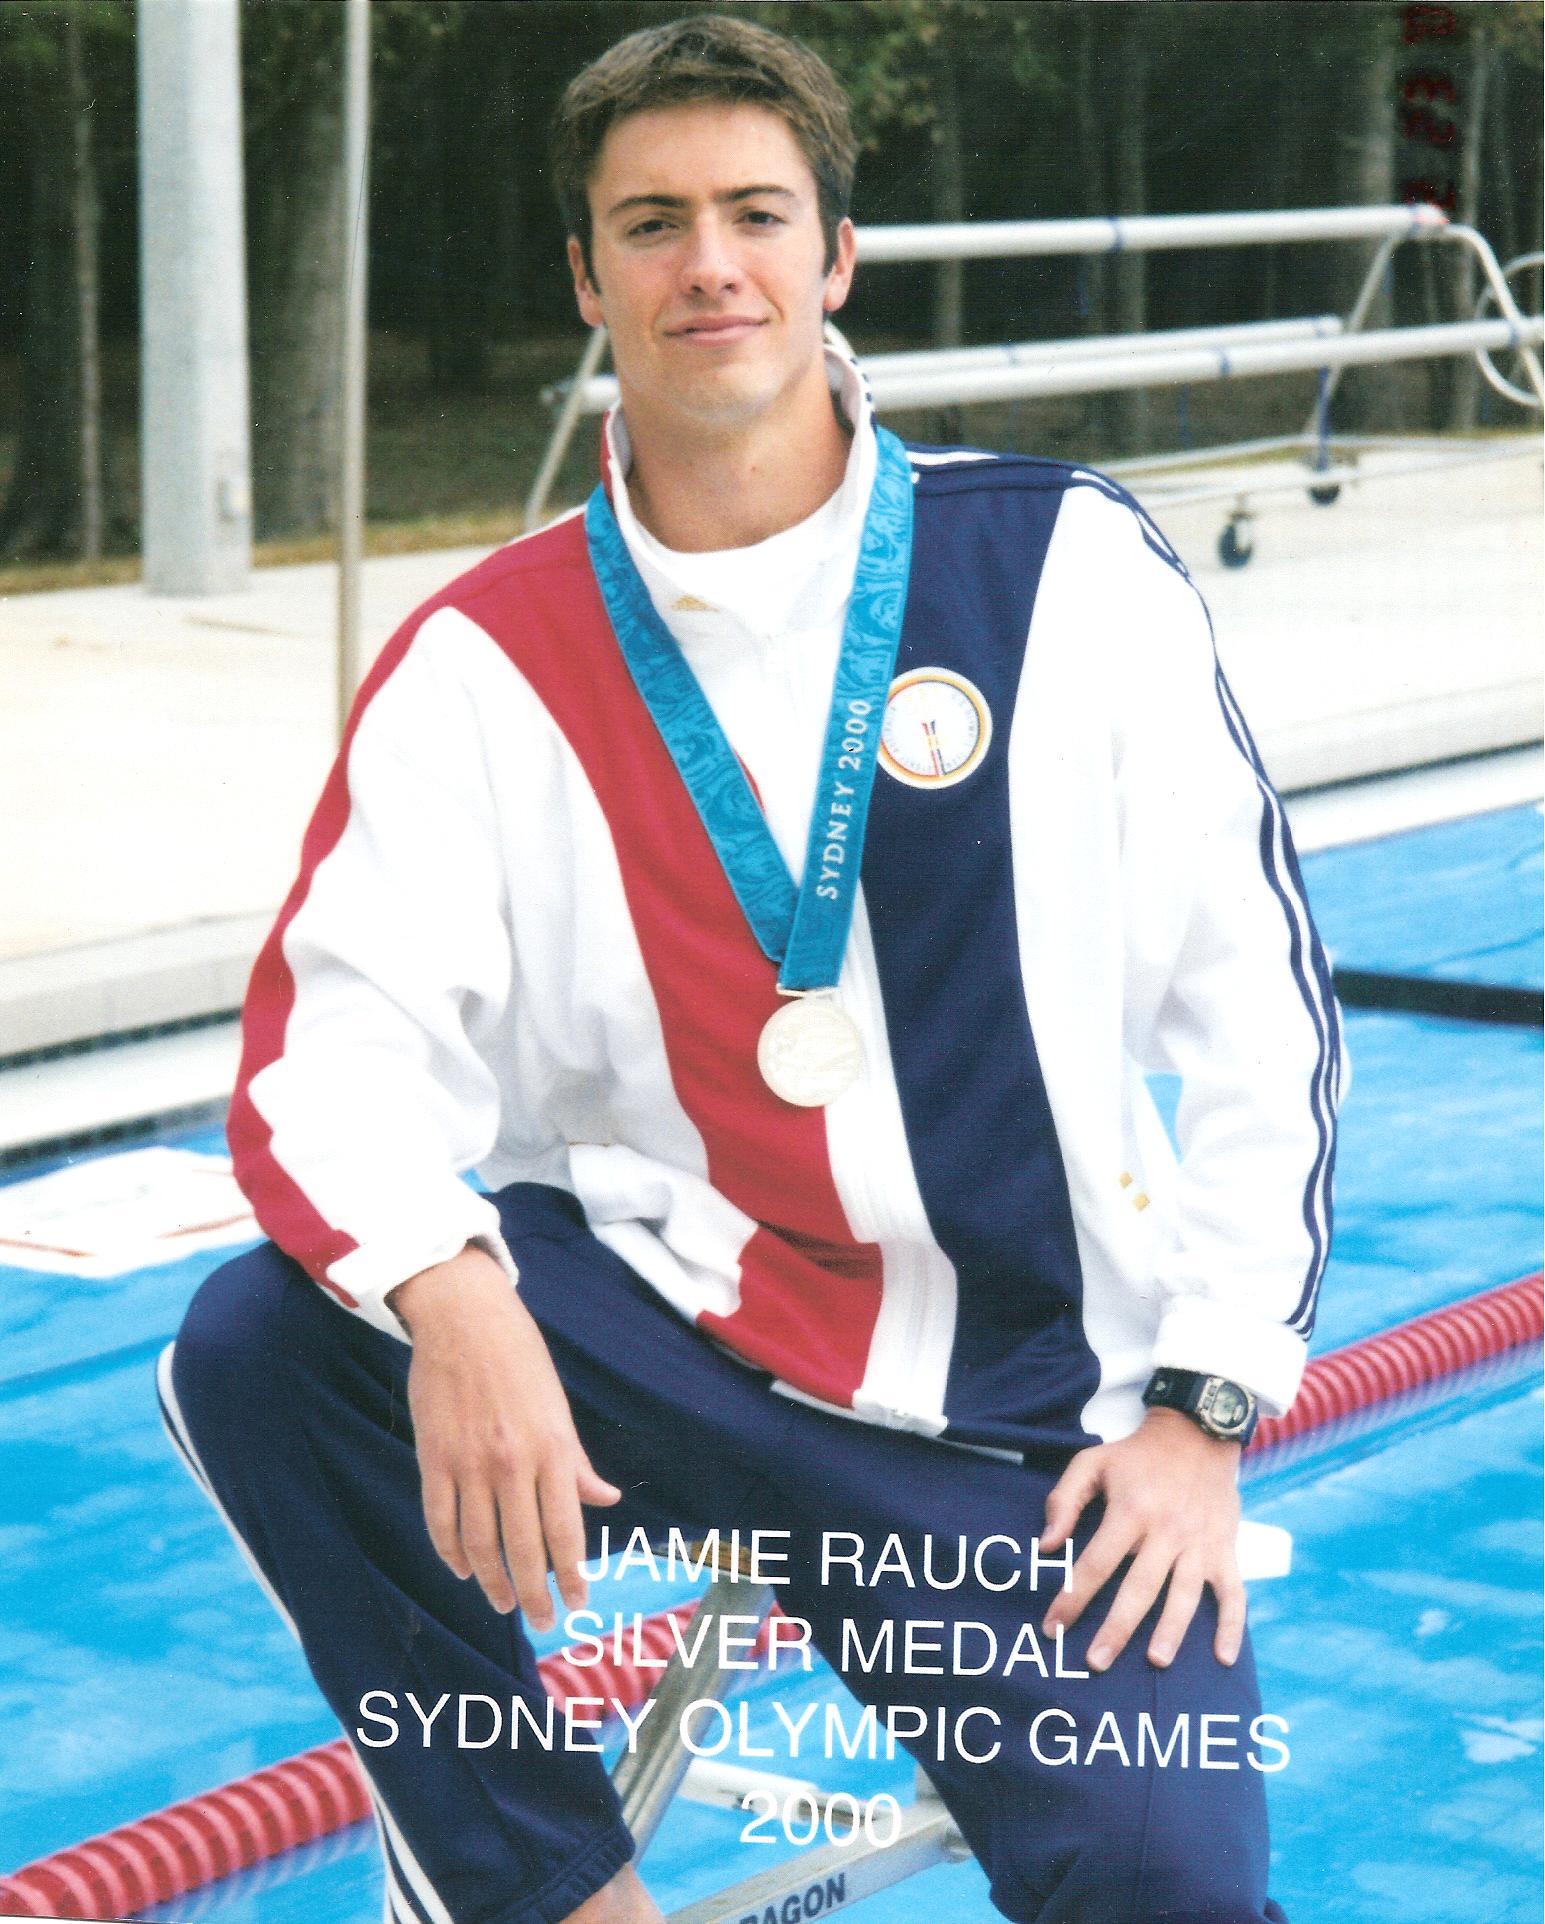 Jamie Rauch  2000 Olympian.JPG